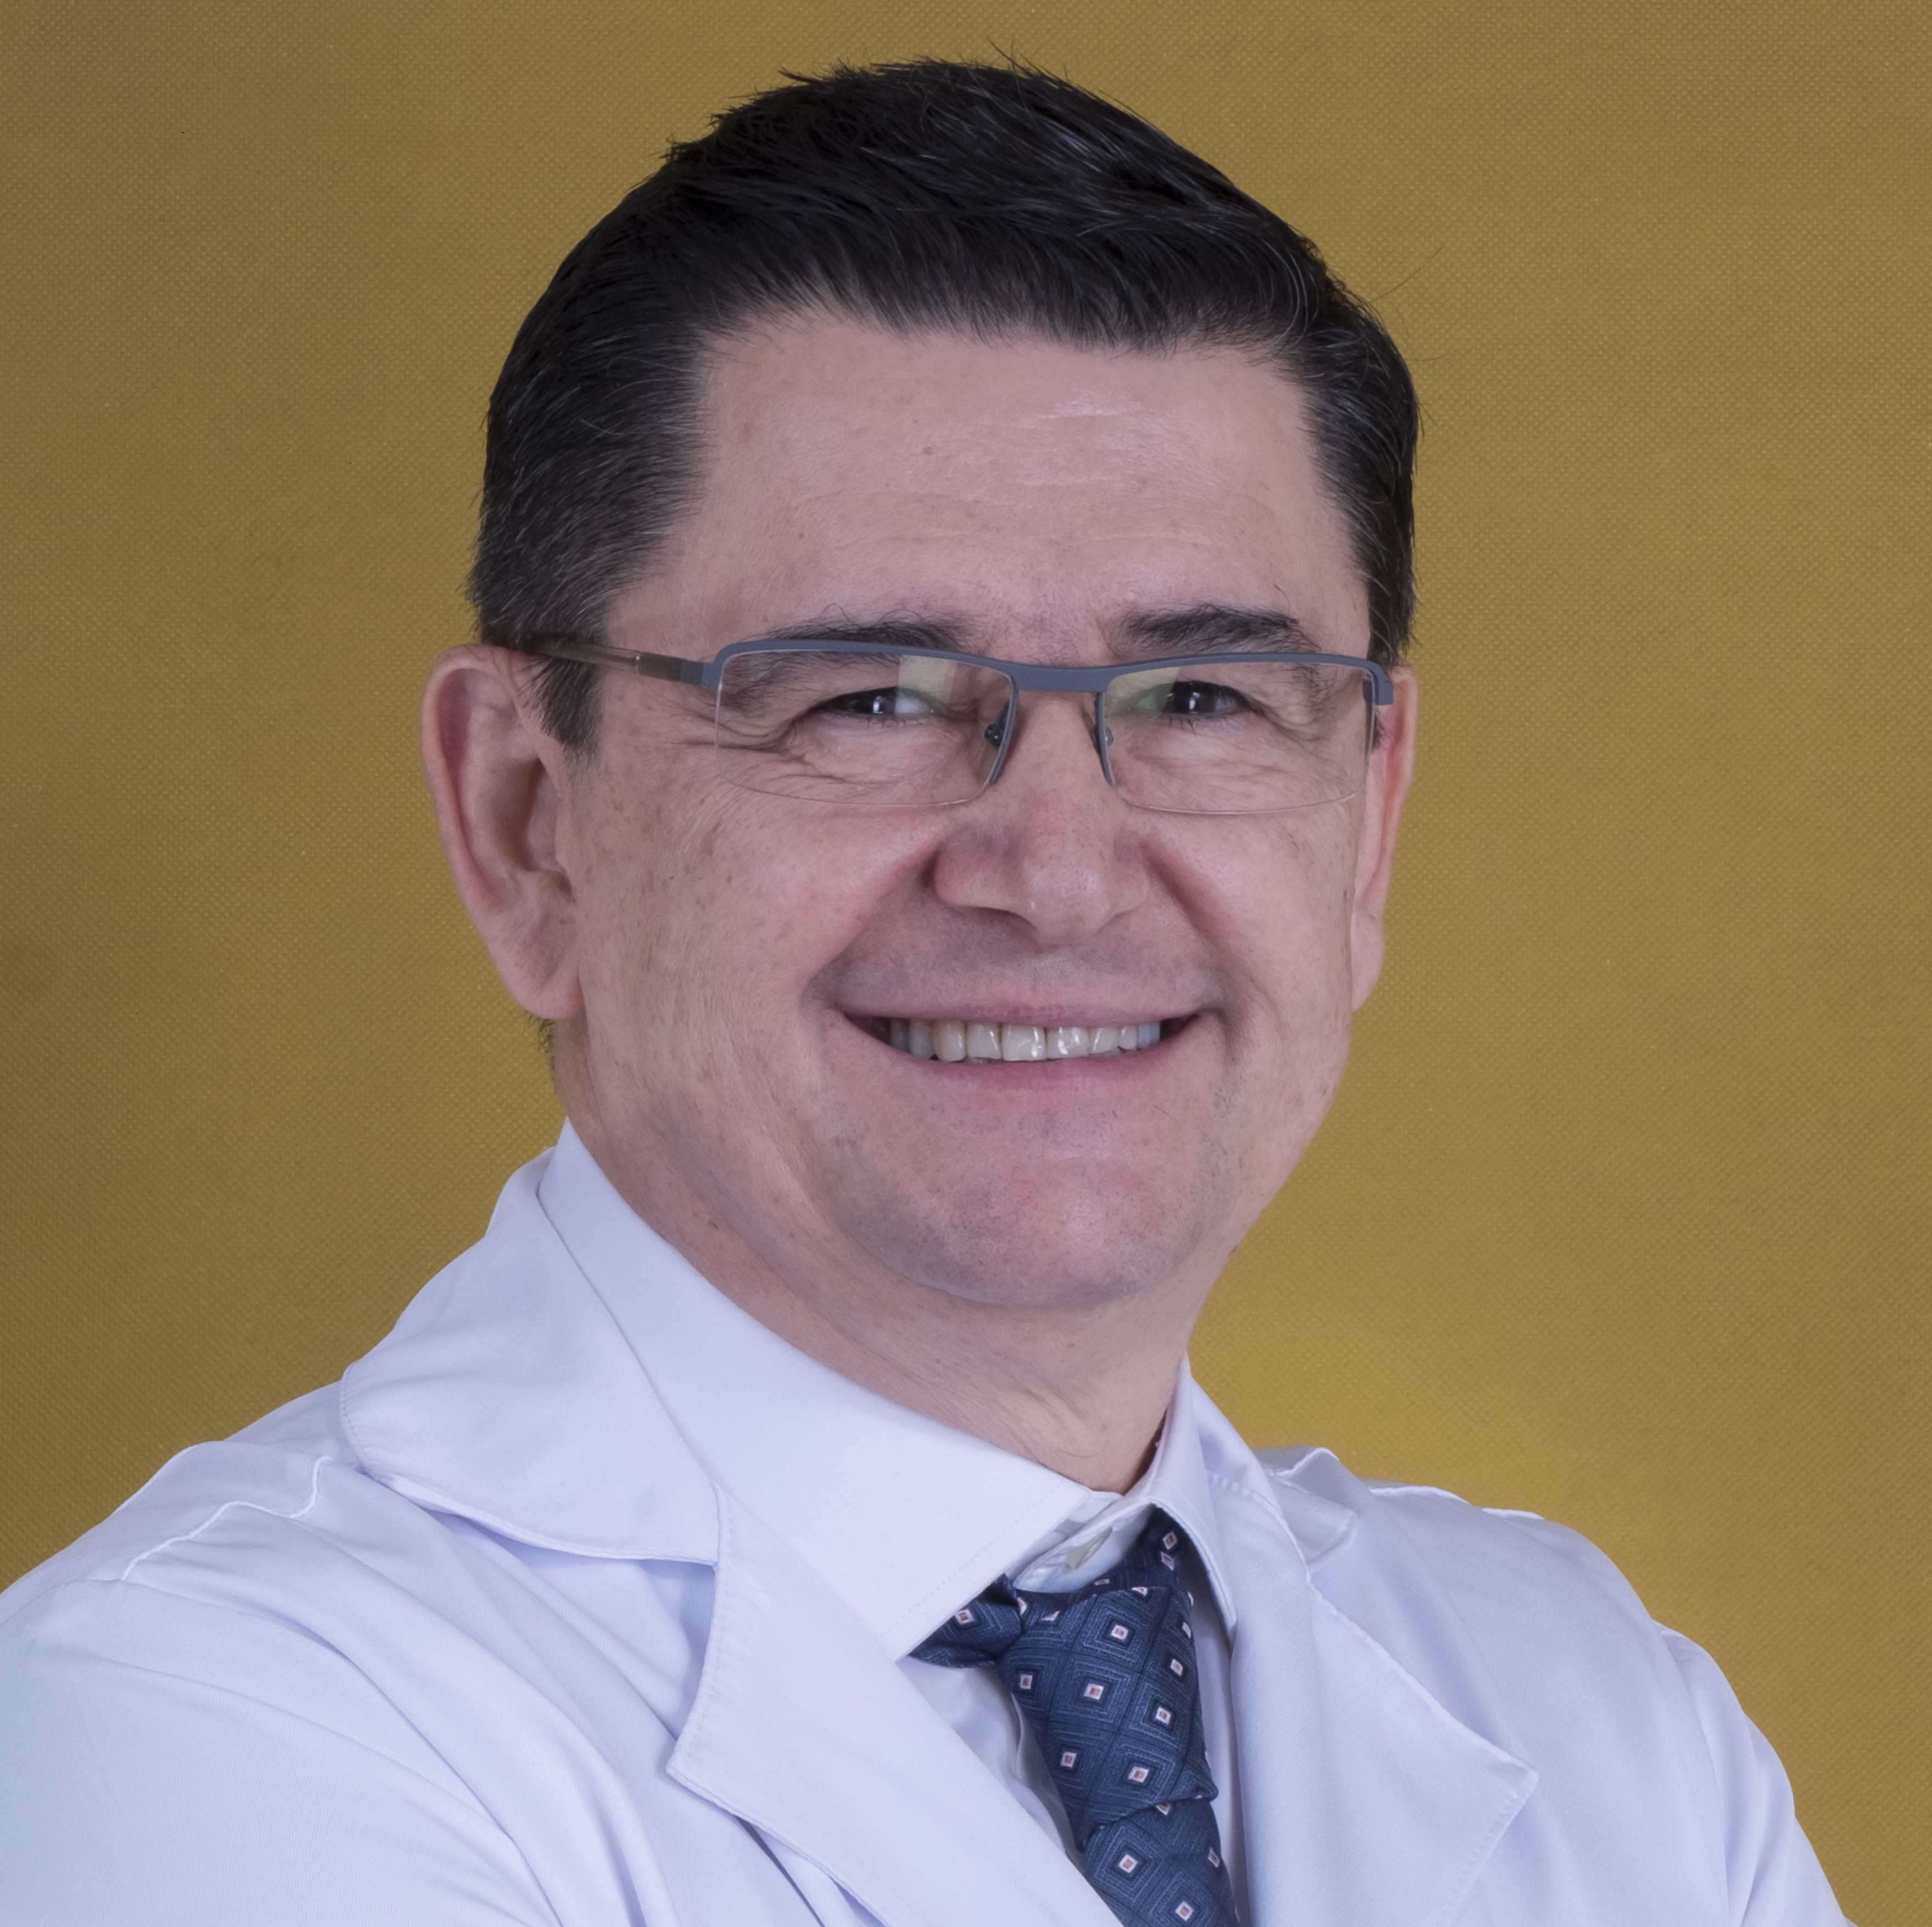 Sergio Rocha Piedade